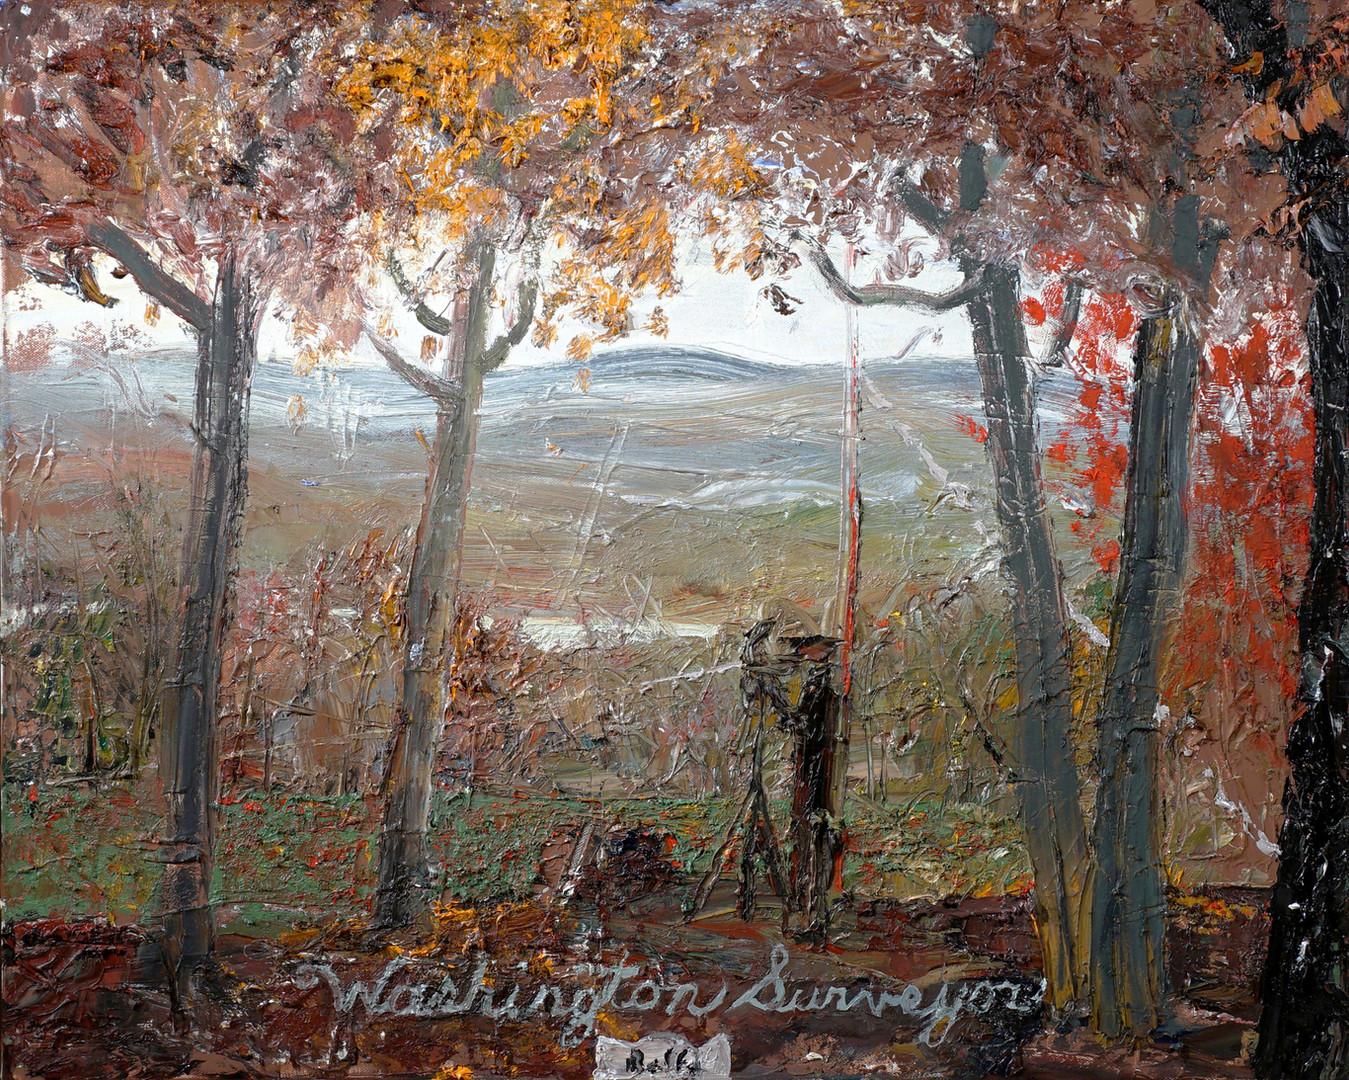 JOHN BRADFORD Washington Surveyor, 2020 acrylic, oil on canvas 24 x 30 in (61 x 76.2 cm)